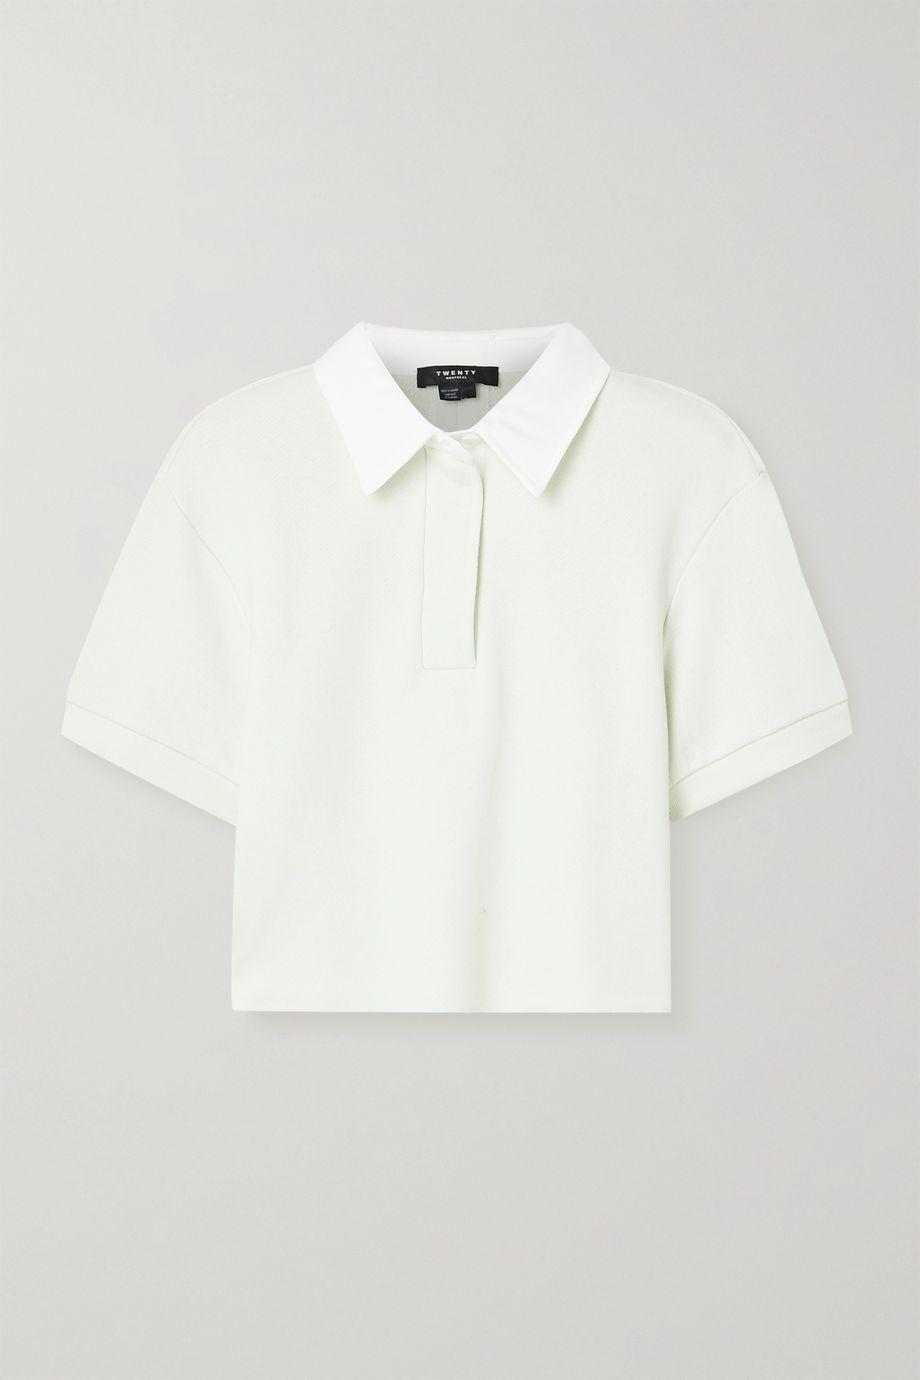 TWENTY Montréal Sunnyside cropped cotton-blend jersey top